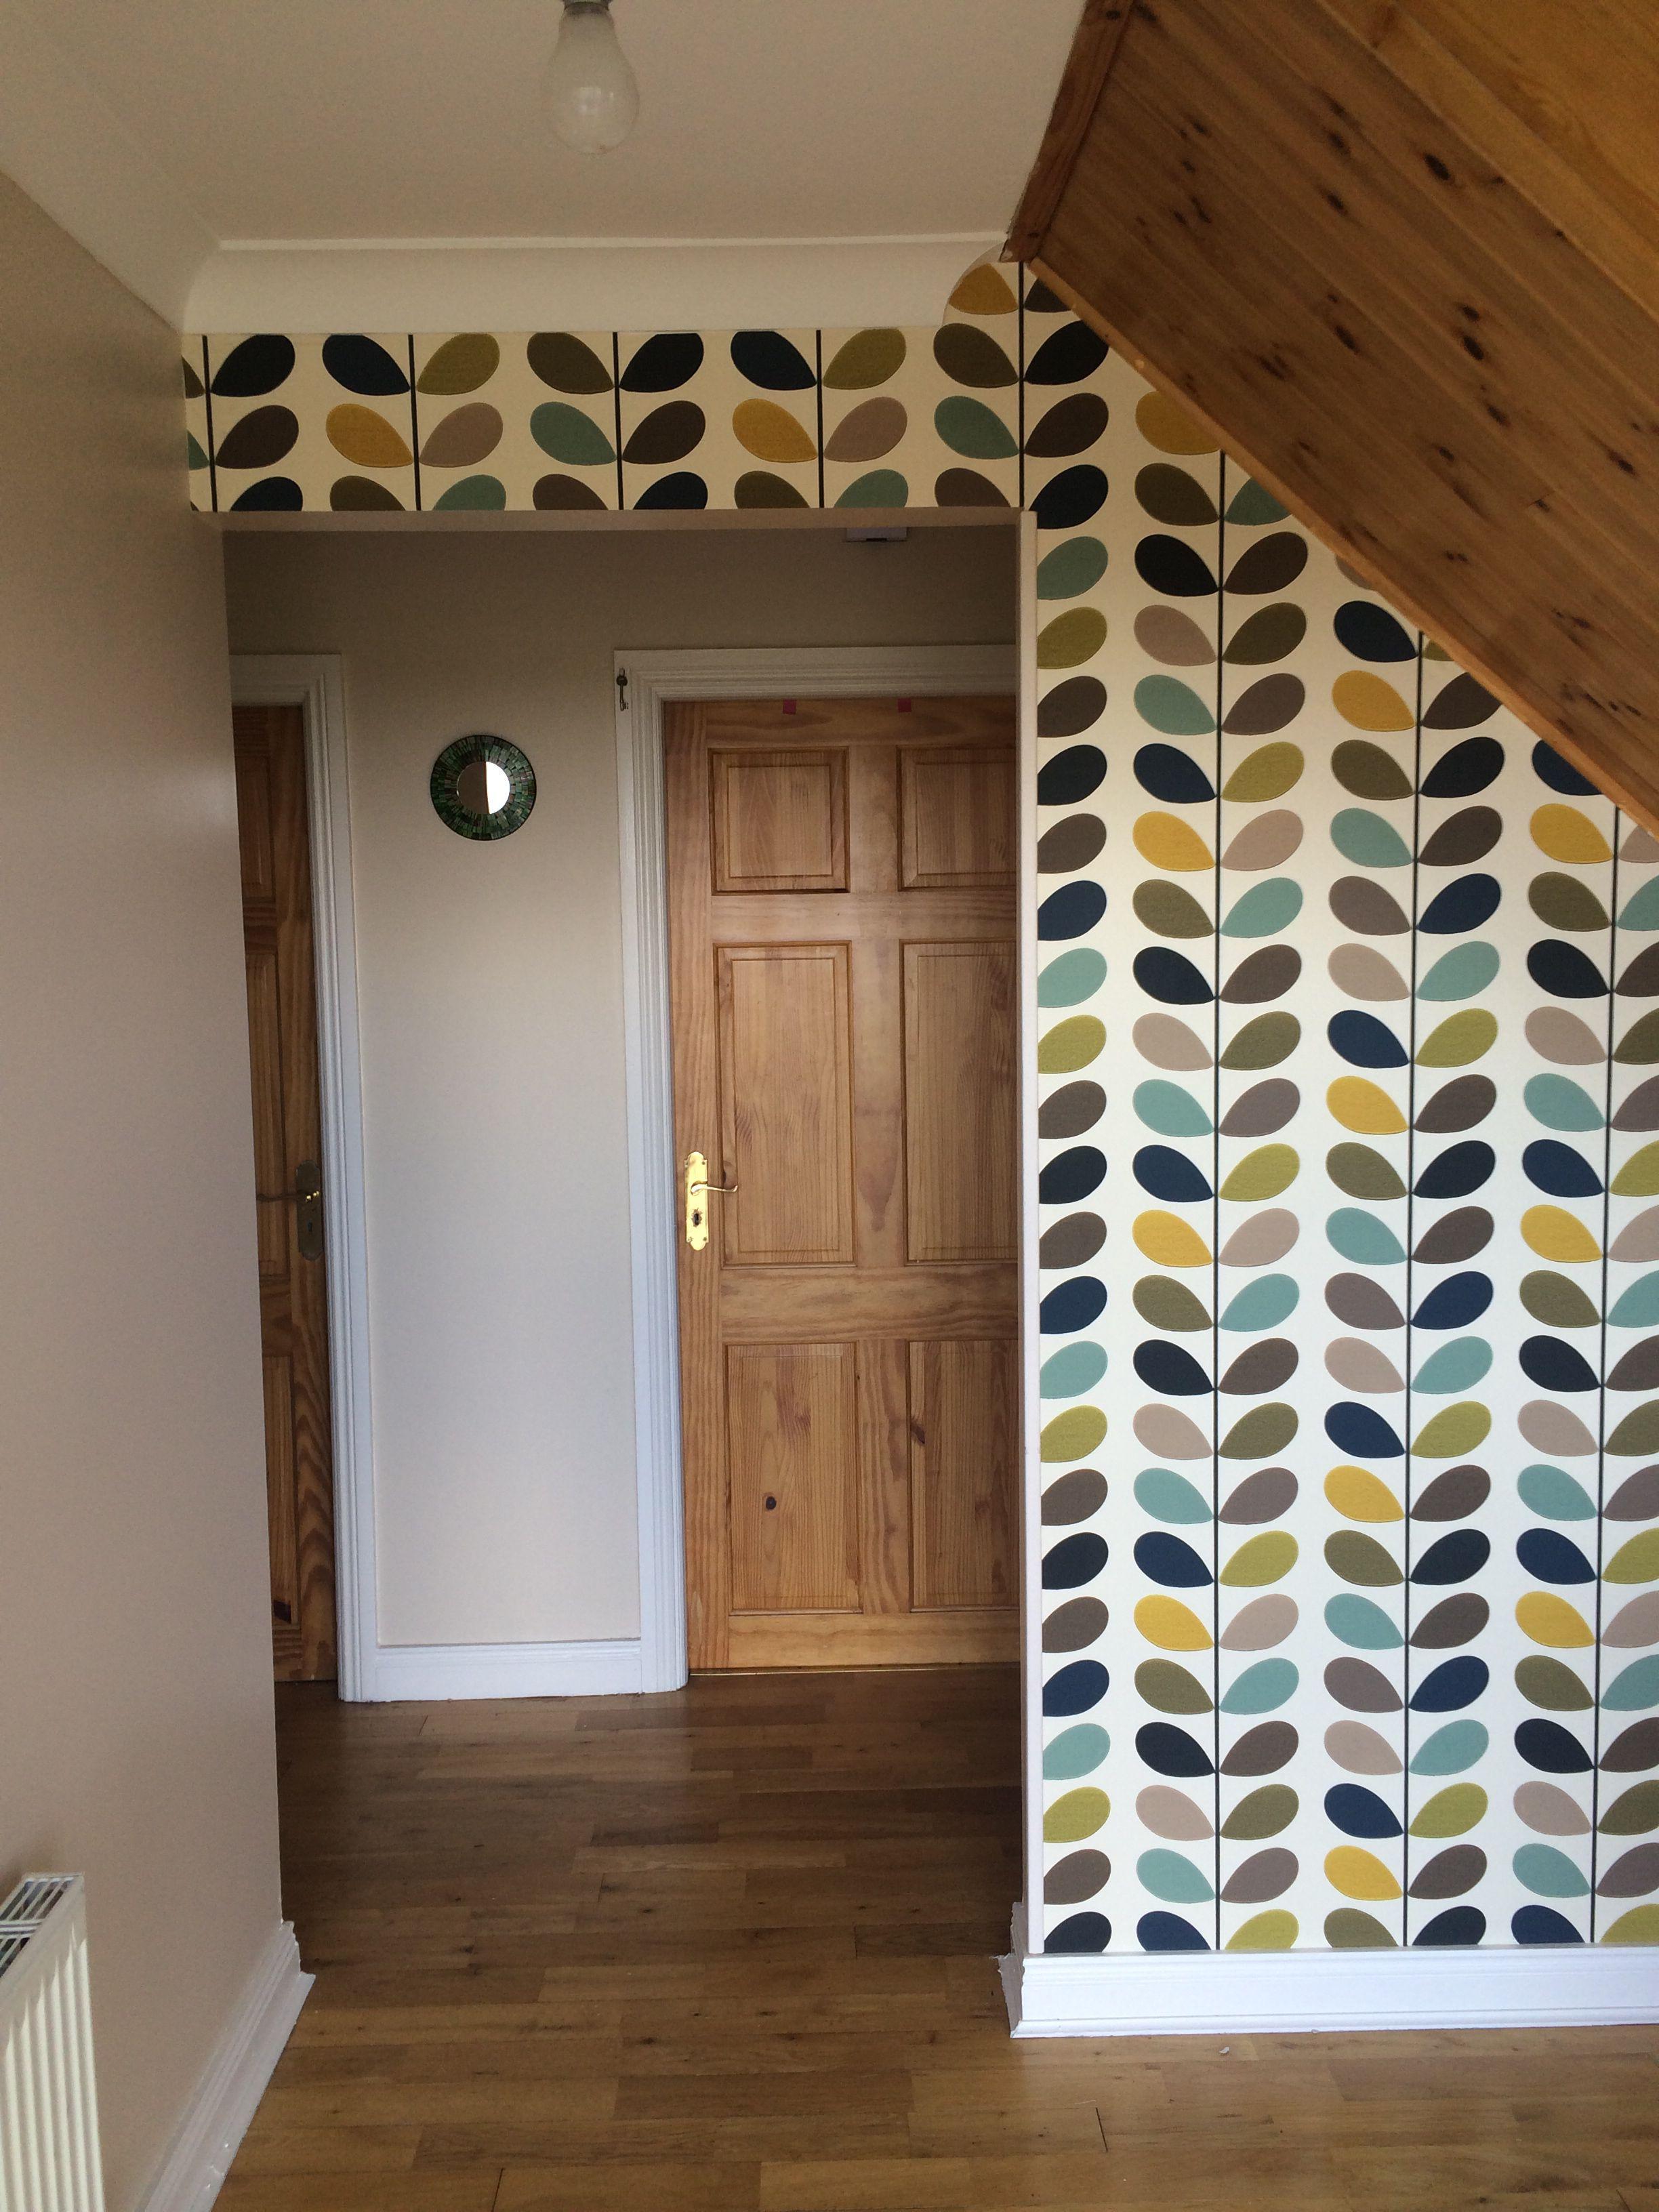 Orla kiely linear stem wallpaper - Orla Kiely Multi Stem Wallpaper Hall